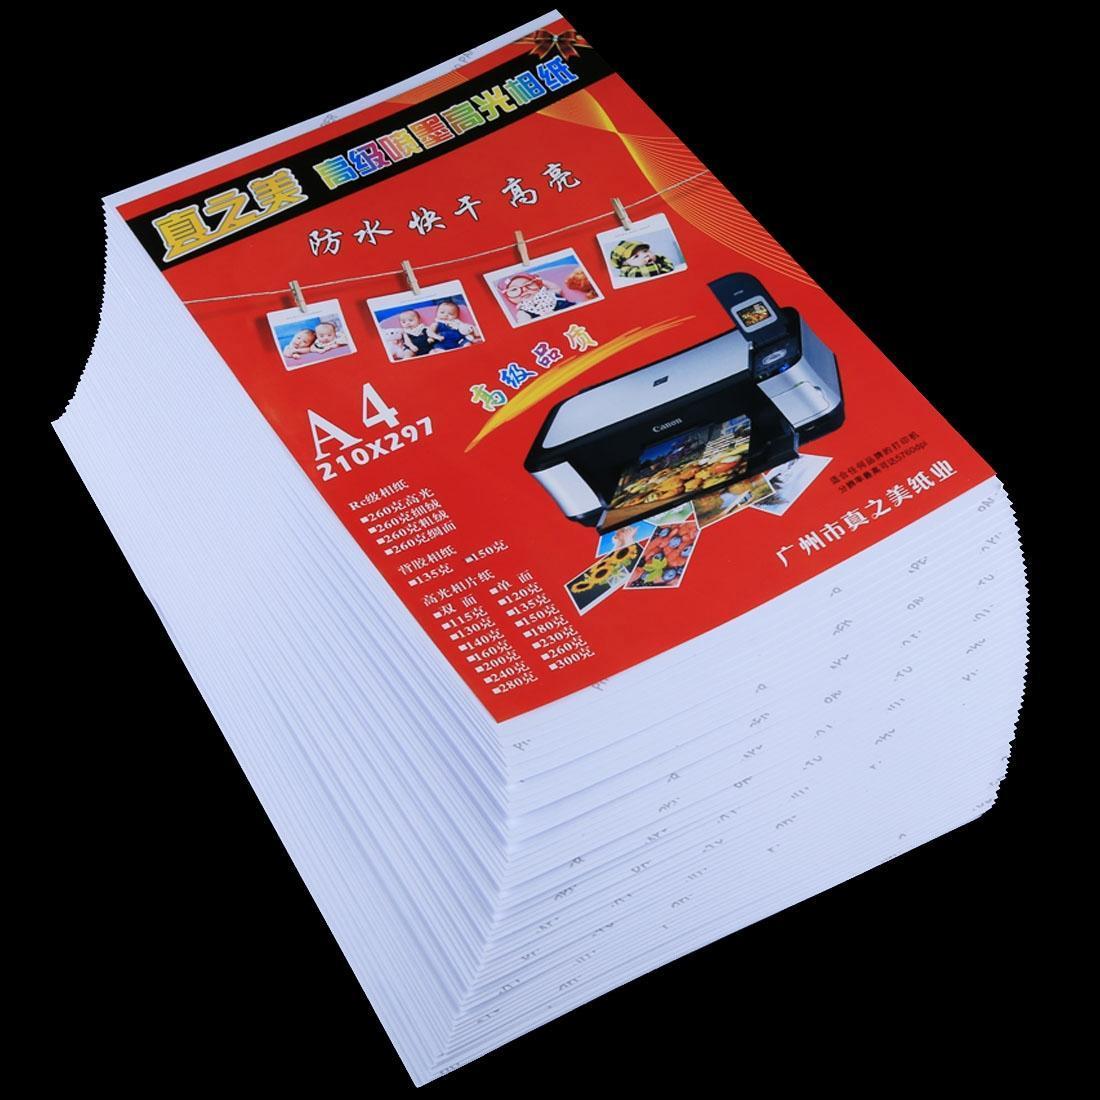 50 Blatt 8,3 x 11,7 Zoll A4 Wasserdicht Fotoglanzpapier für Inkjet-Drucker